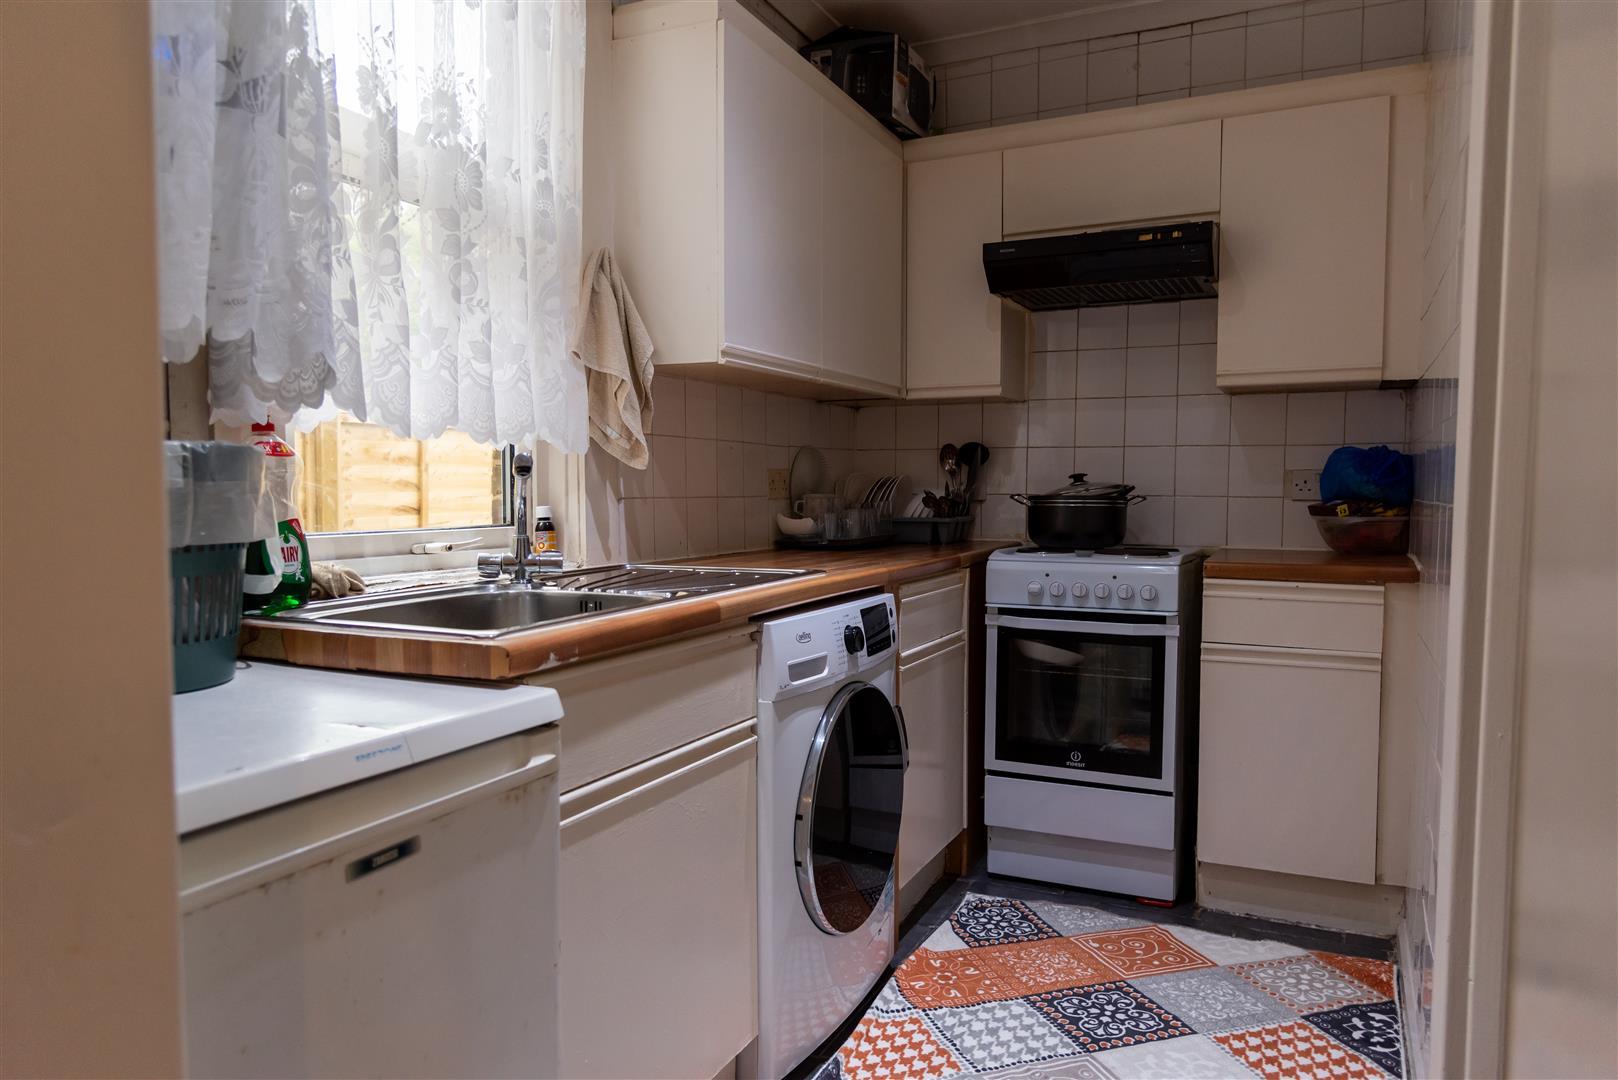 2 Bedroom Garden Flat For Sale Heysham Road, N15